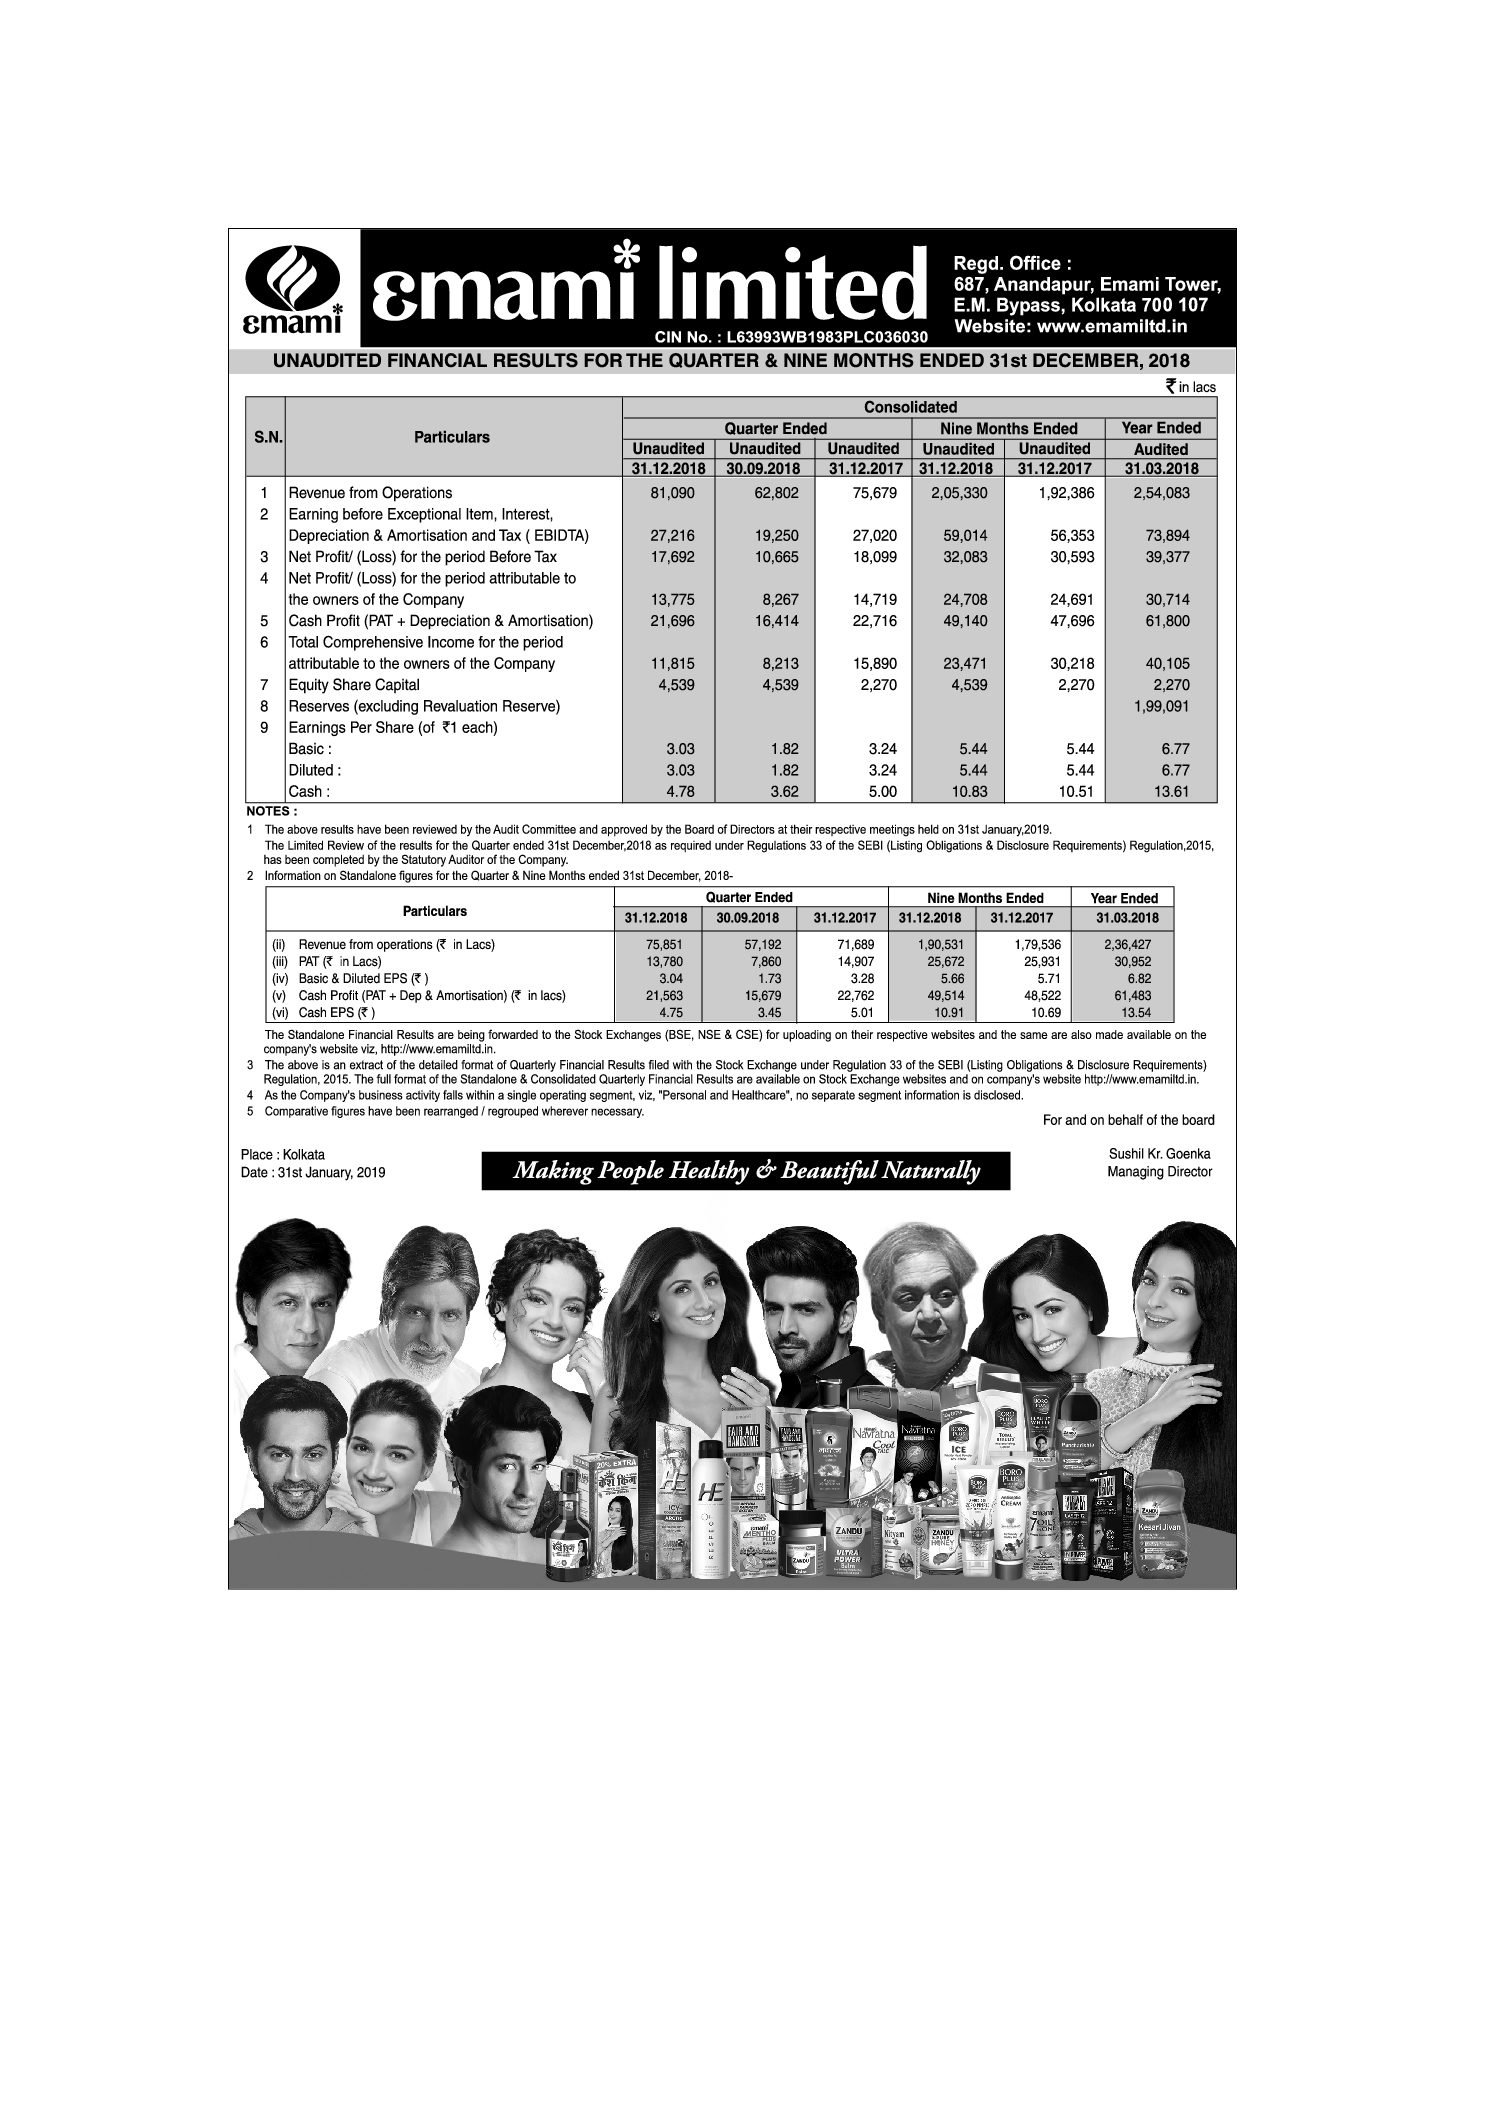 EMAMI REGISTERS 8% TOPLINE GROWTH IN Q3 & 9MFY19